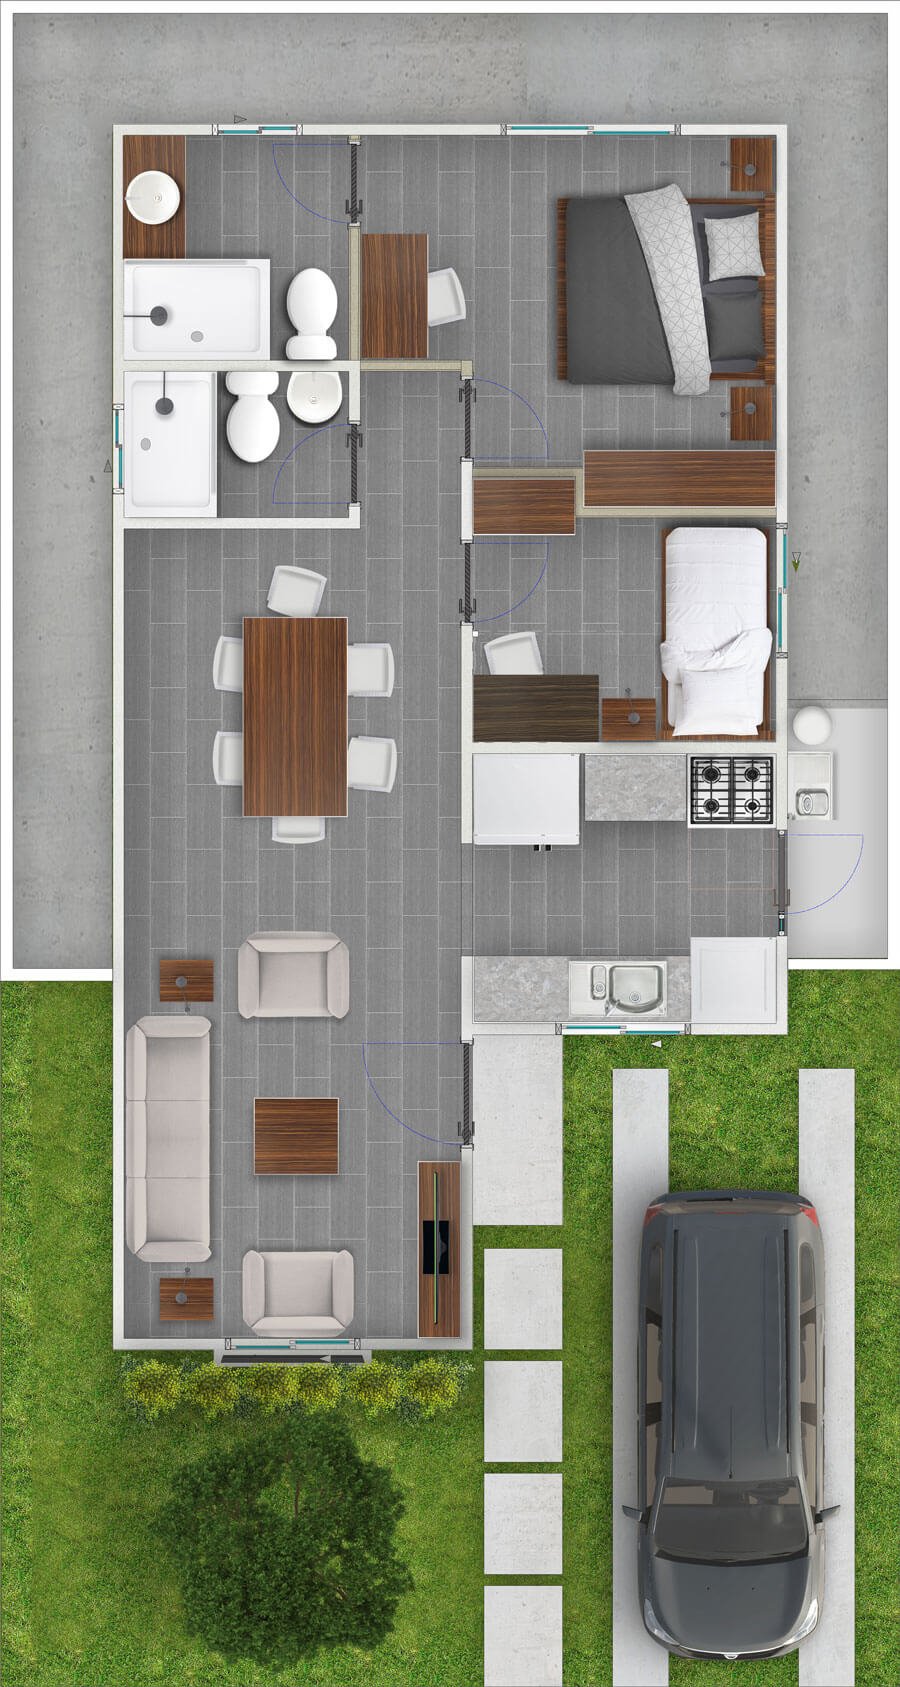 galilea-inmobiliaria-constructora-ecuador-render-interior-casa-modelo-azalea-58-m2-tipo-2